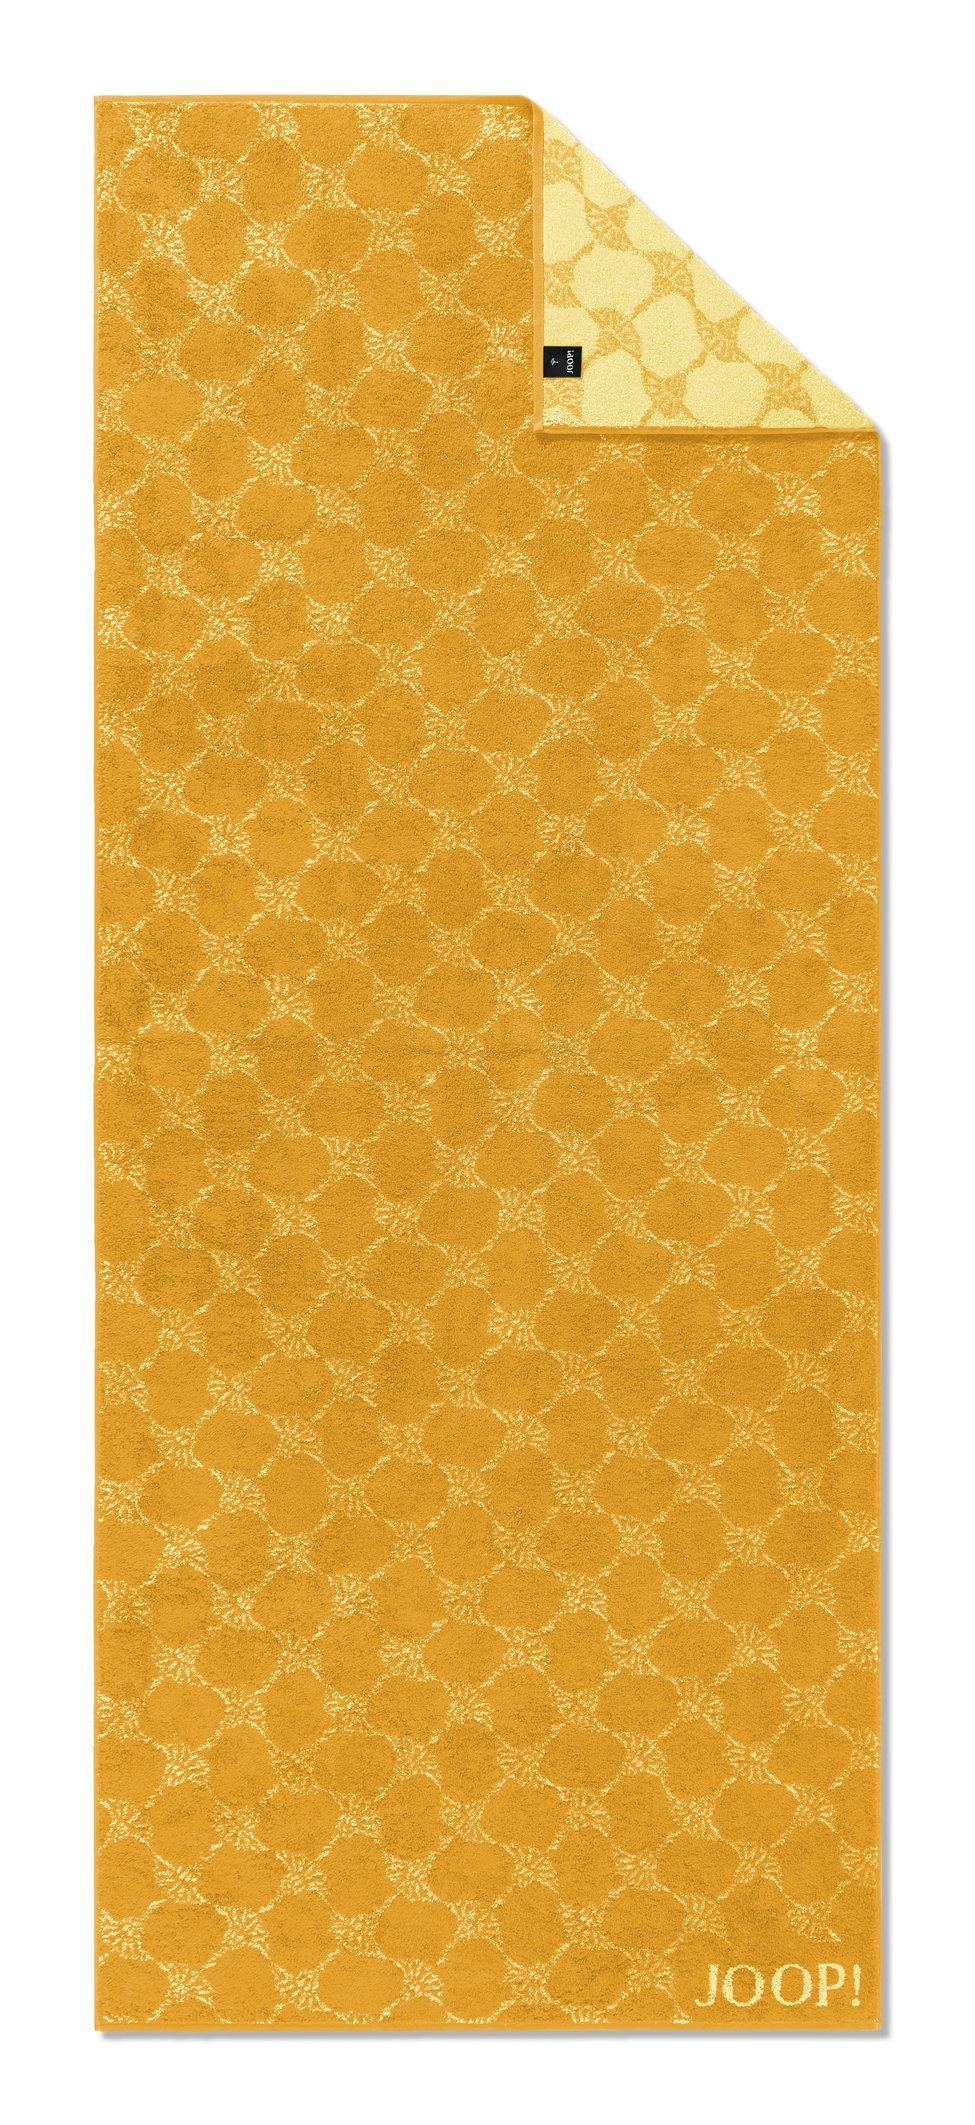 JOOP! Cornflower 1611-50 Honig Saunatuch 80x200 cm Kollektion 2020